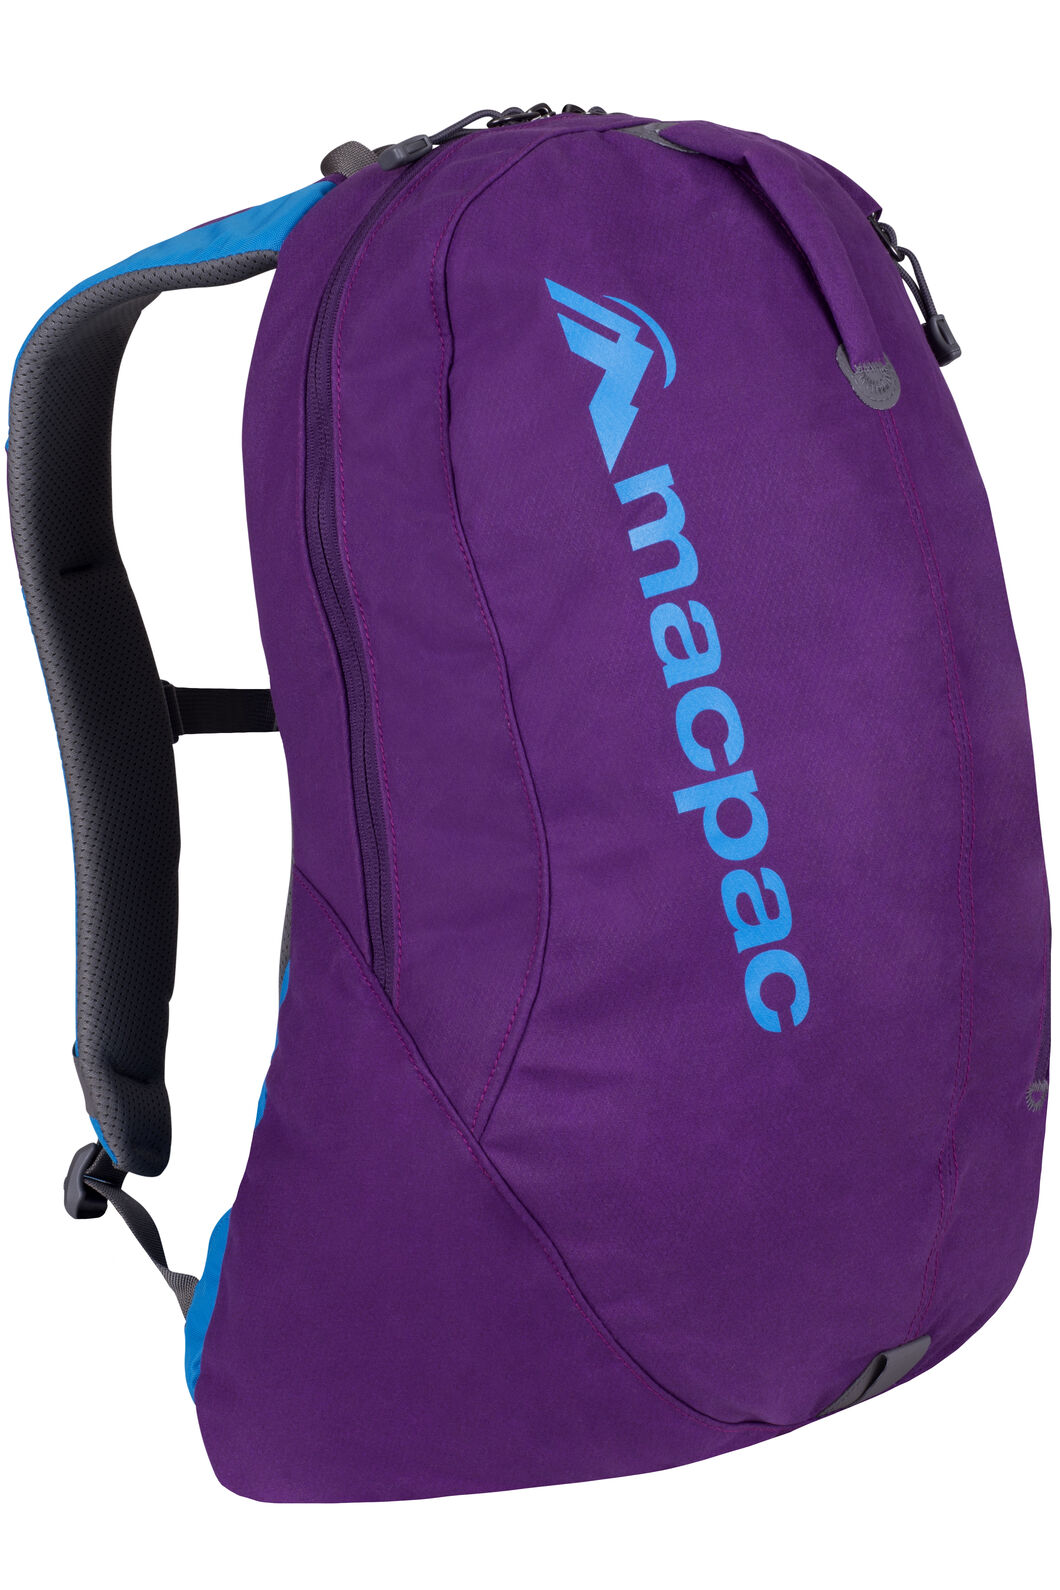 Macpac Kahu 22L AzTec® Backpack, Gloxinia/Cloisonne, hi-res